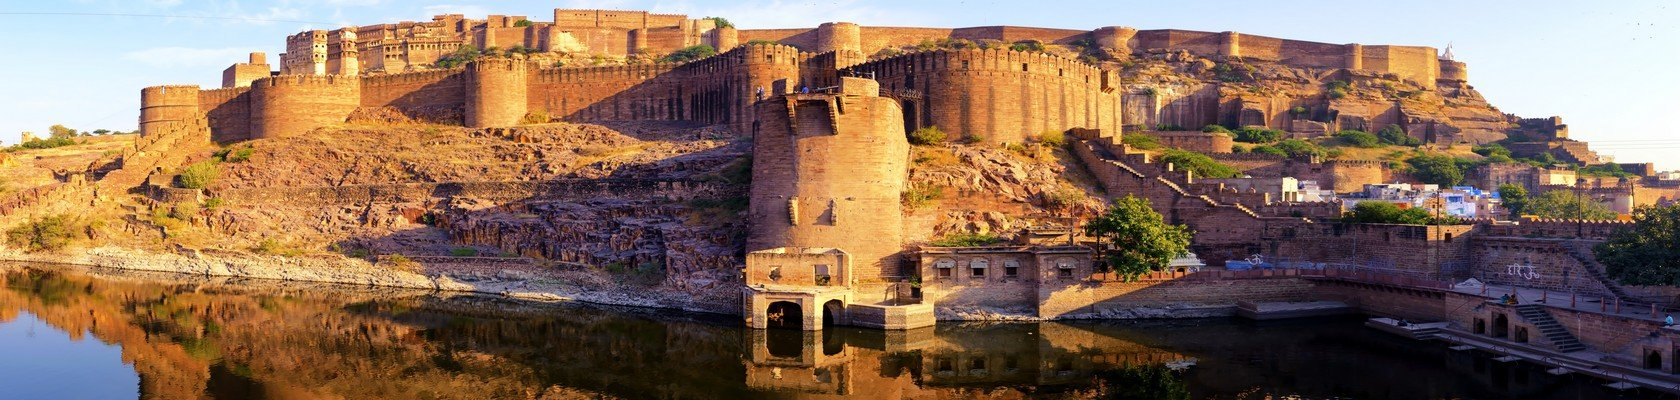 Het imposante Mehrangarh Fort